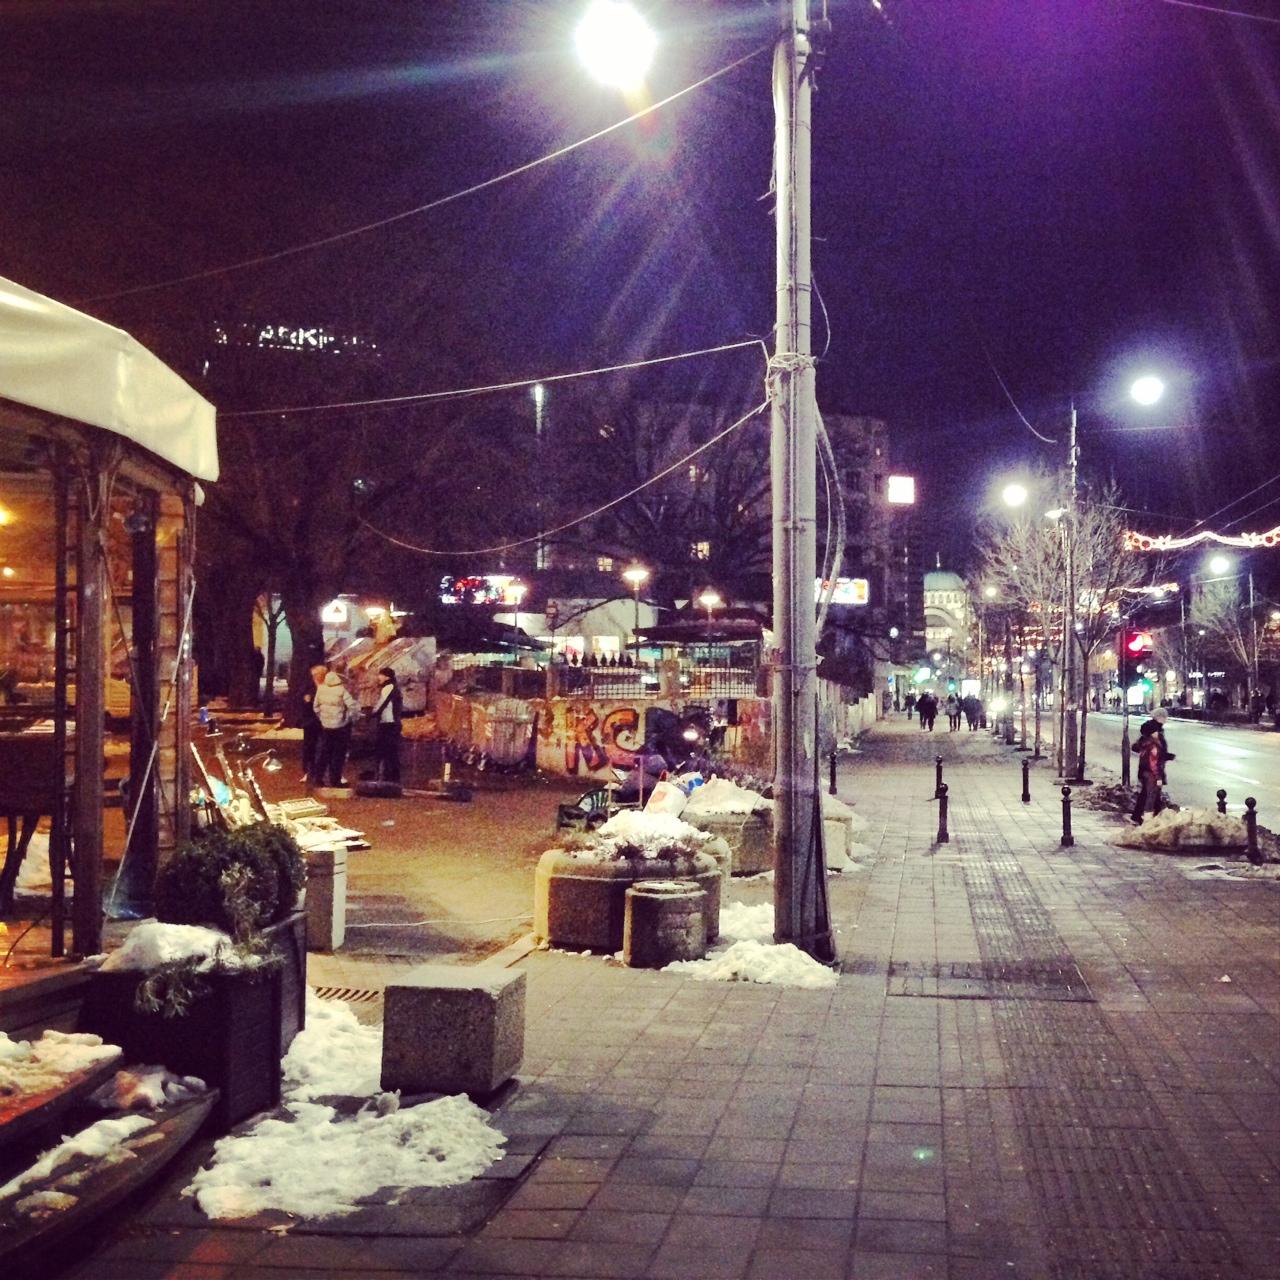 Belgrade la nuit, j'adore